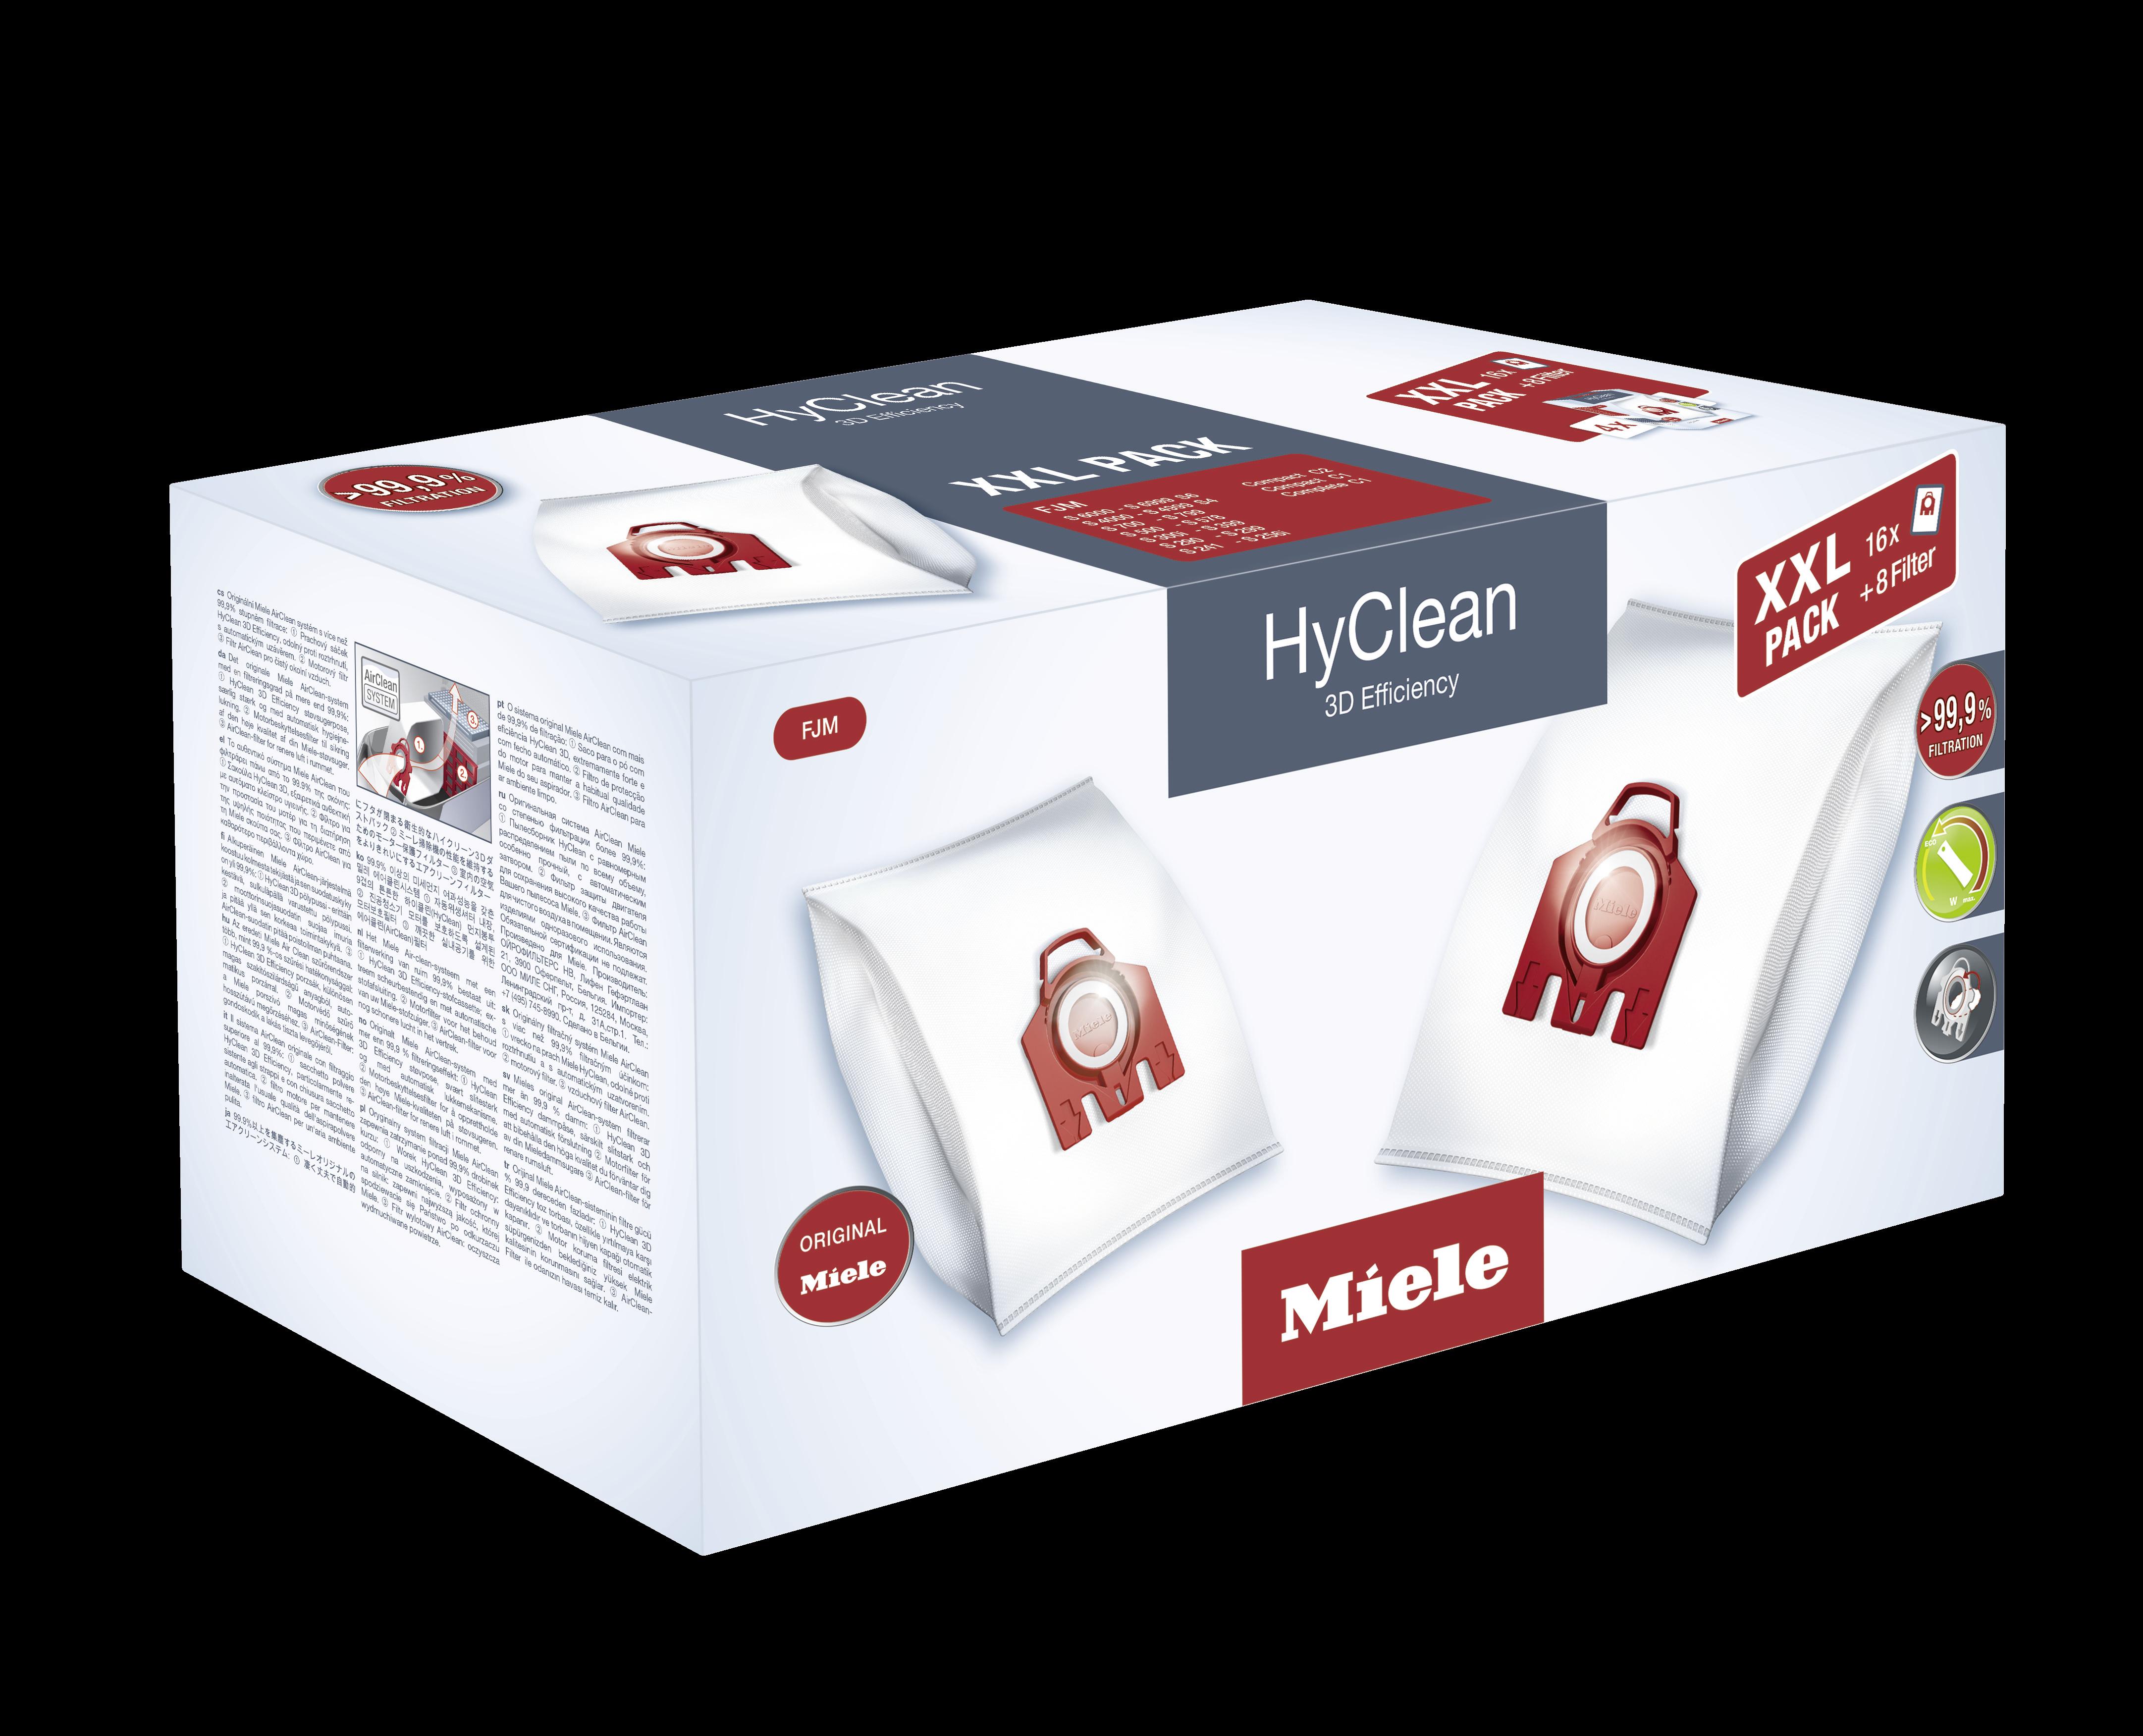 Original MIELE Maxipack Hyclean FMJ 3d pour miele s 6210 premium-Edition